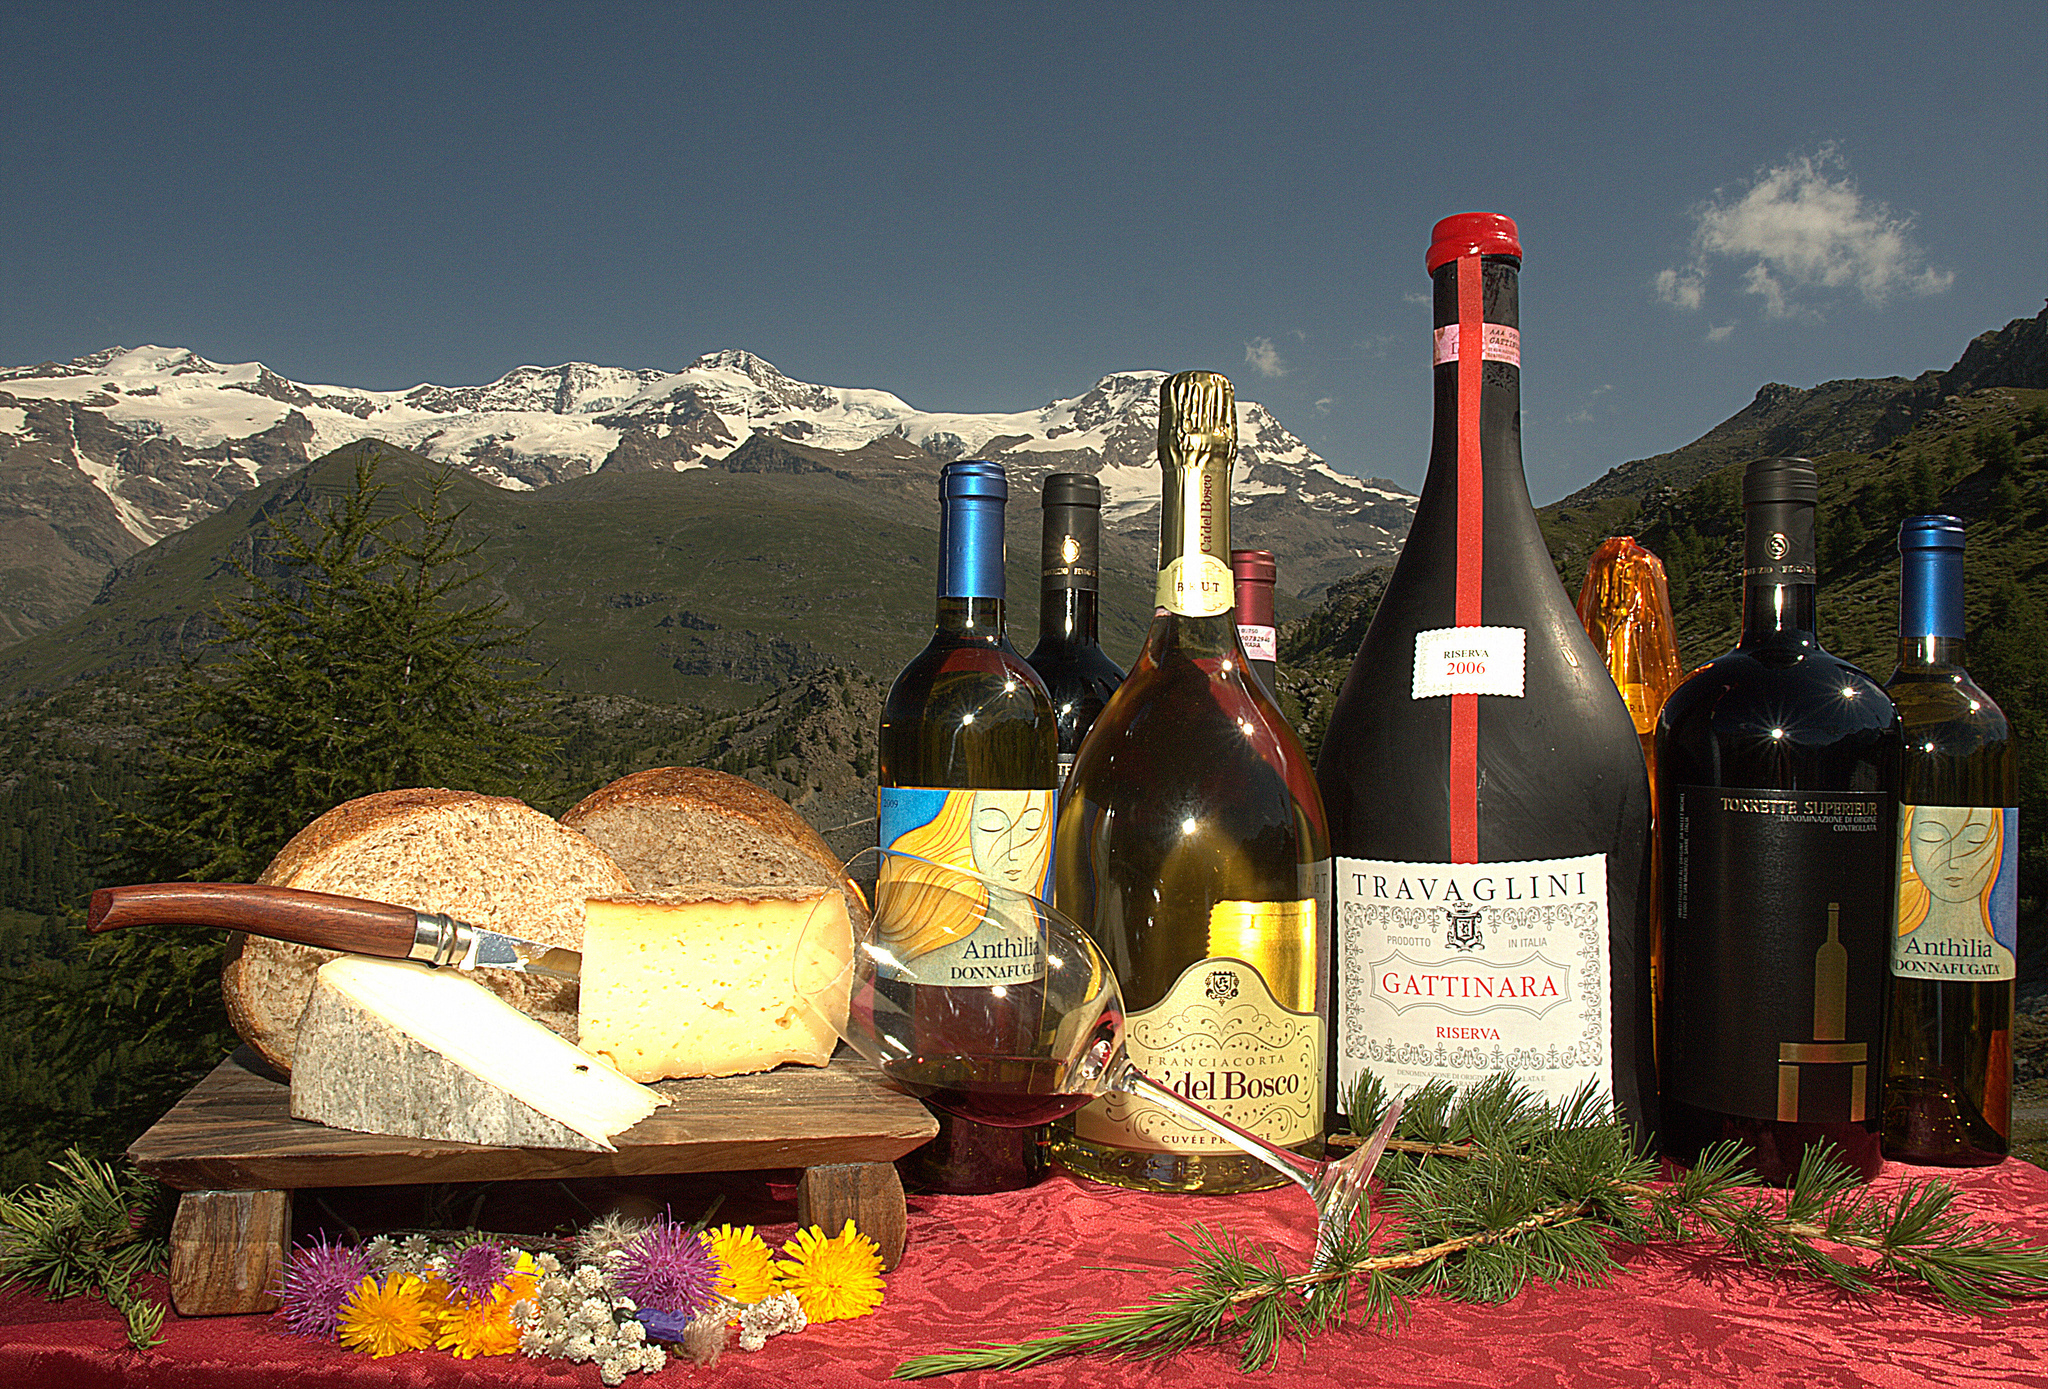 Gattinara mountains piedmont nebbiolo wines